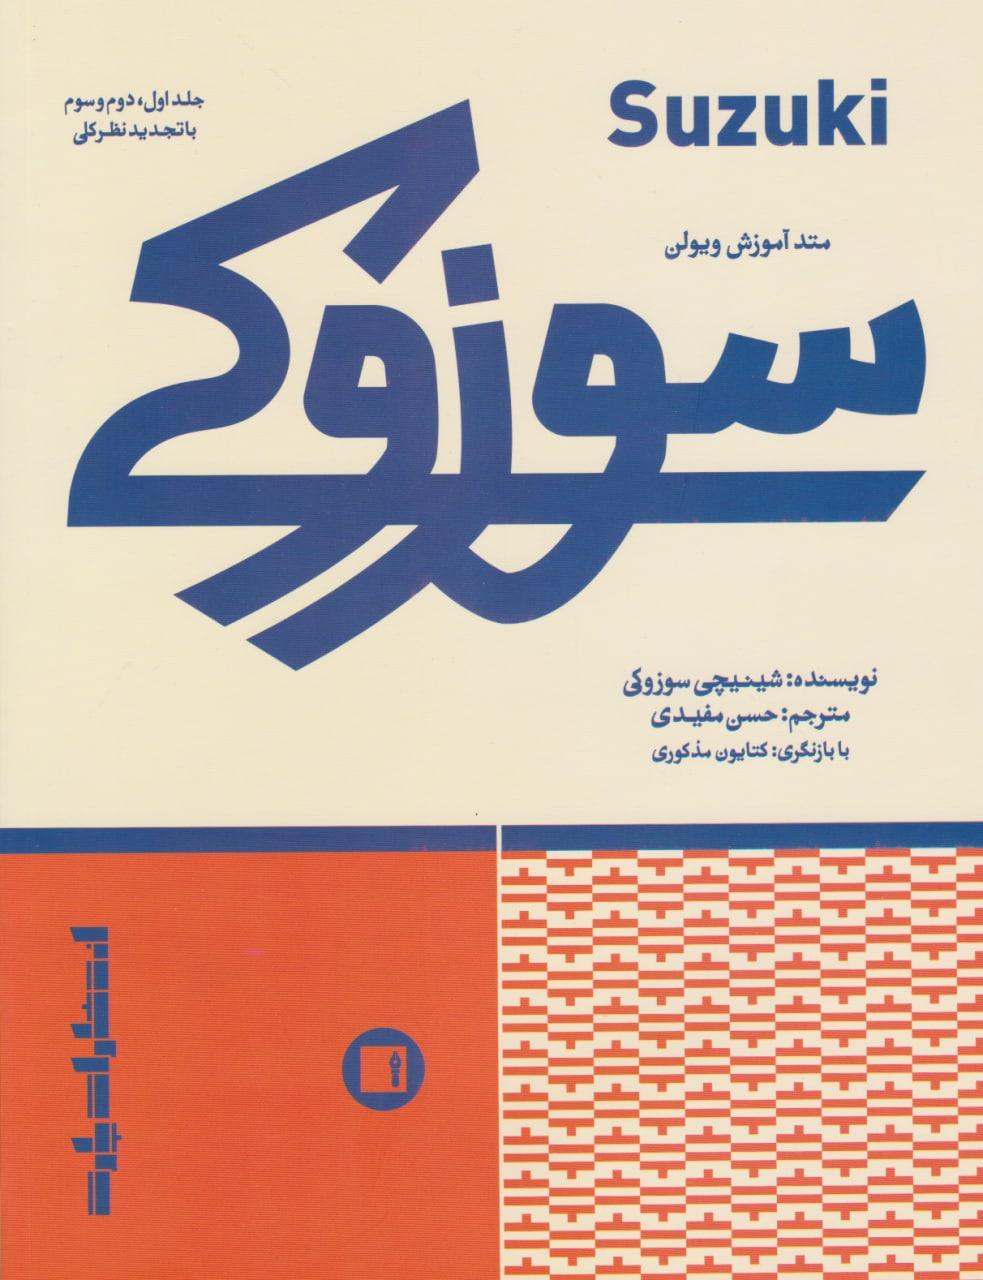 کتاب اول دوم سوم سوزوکی شینیچی سوزوکی انتشارات پارت